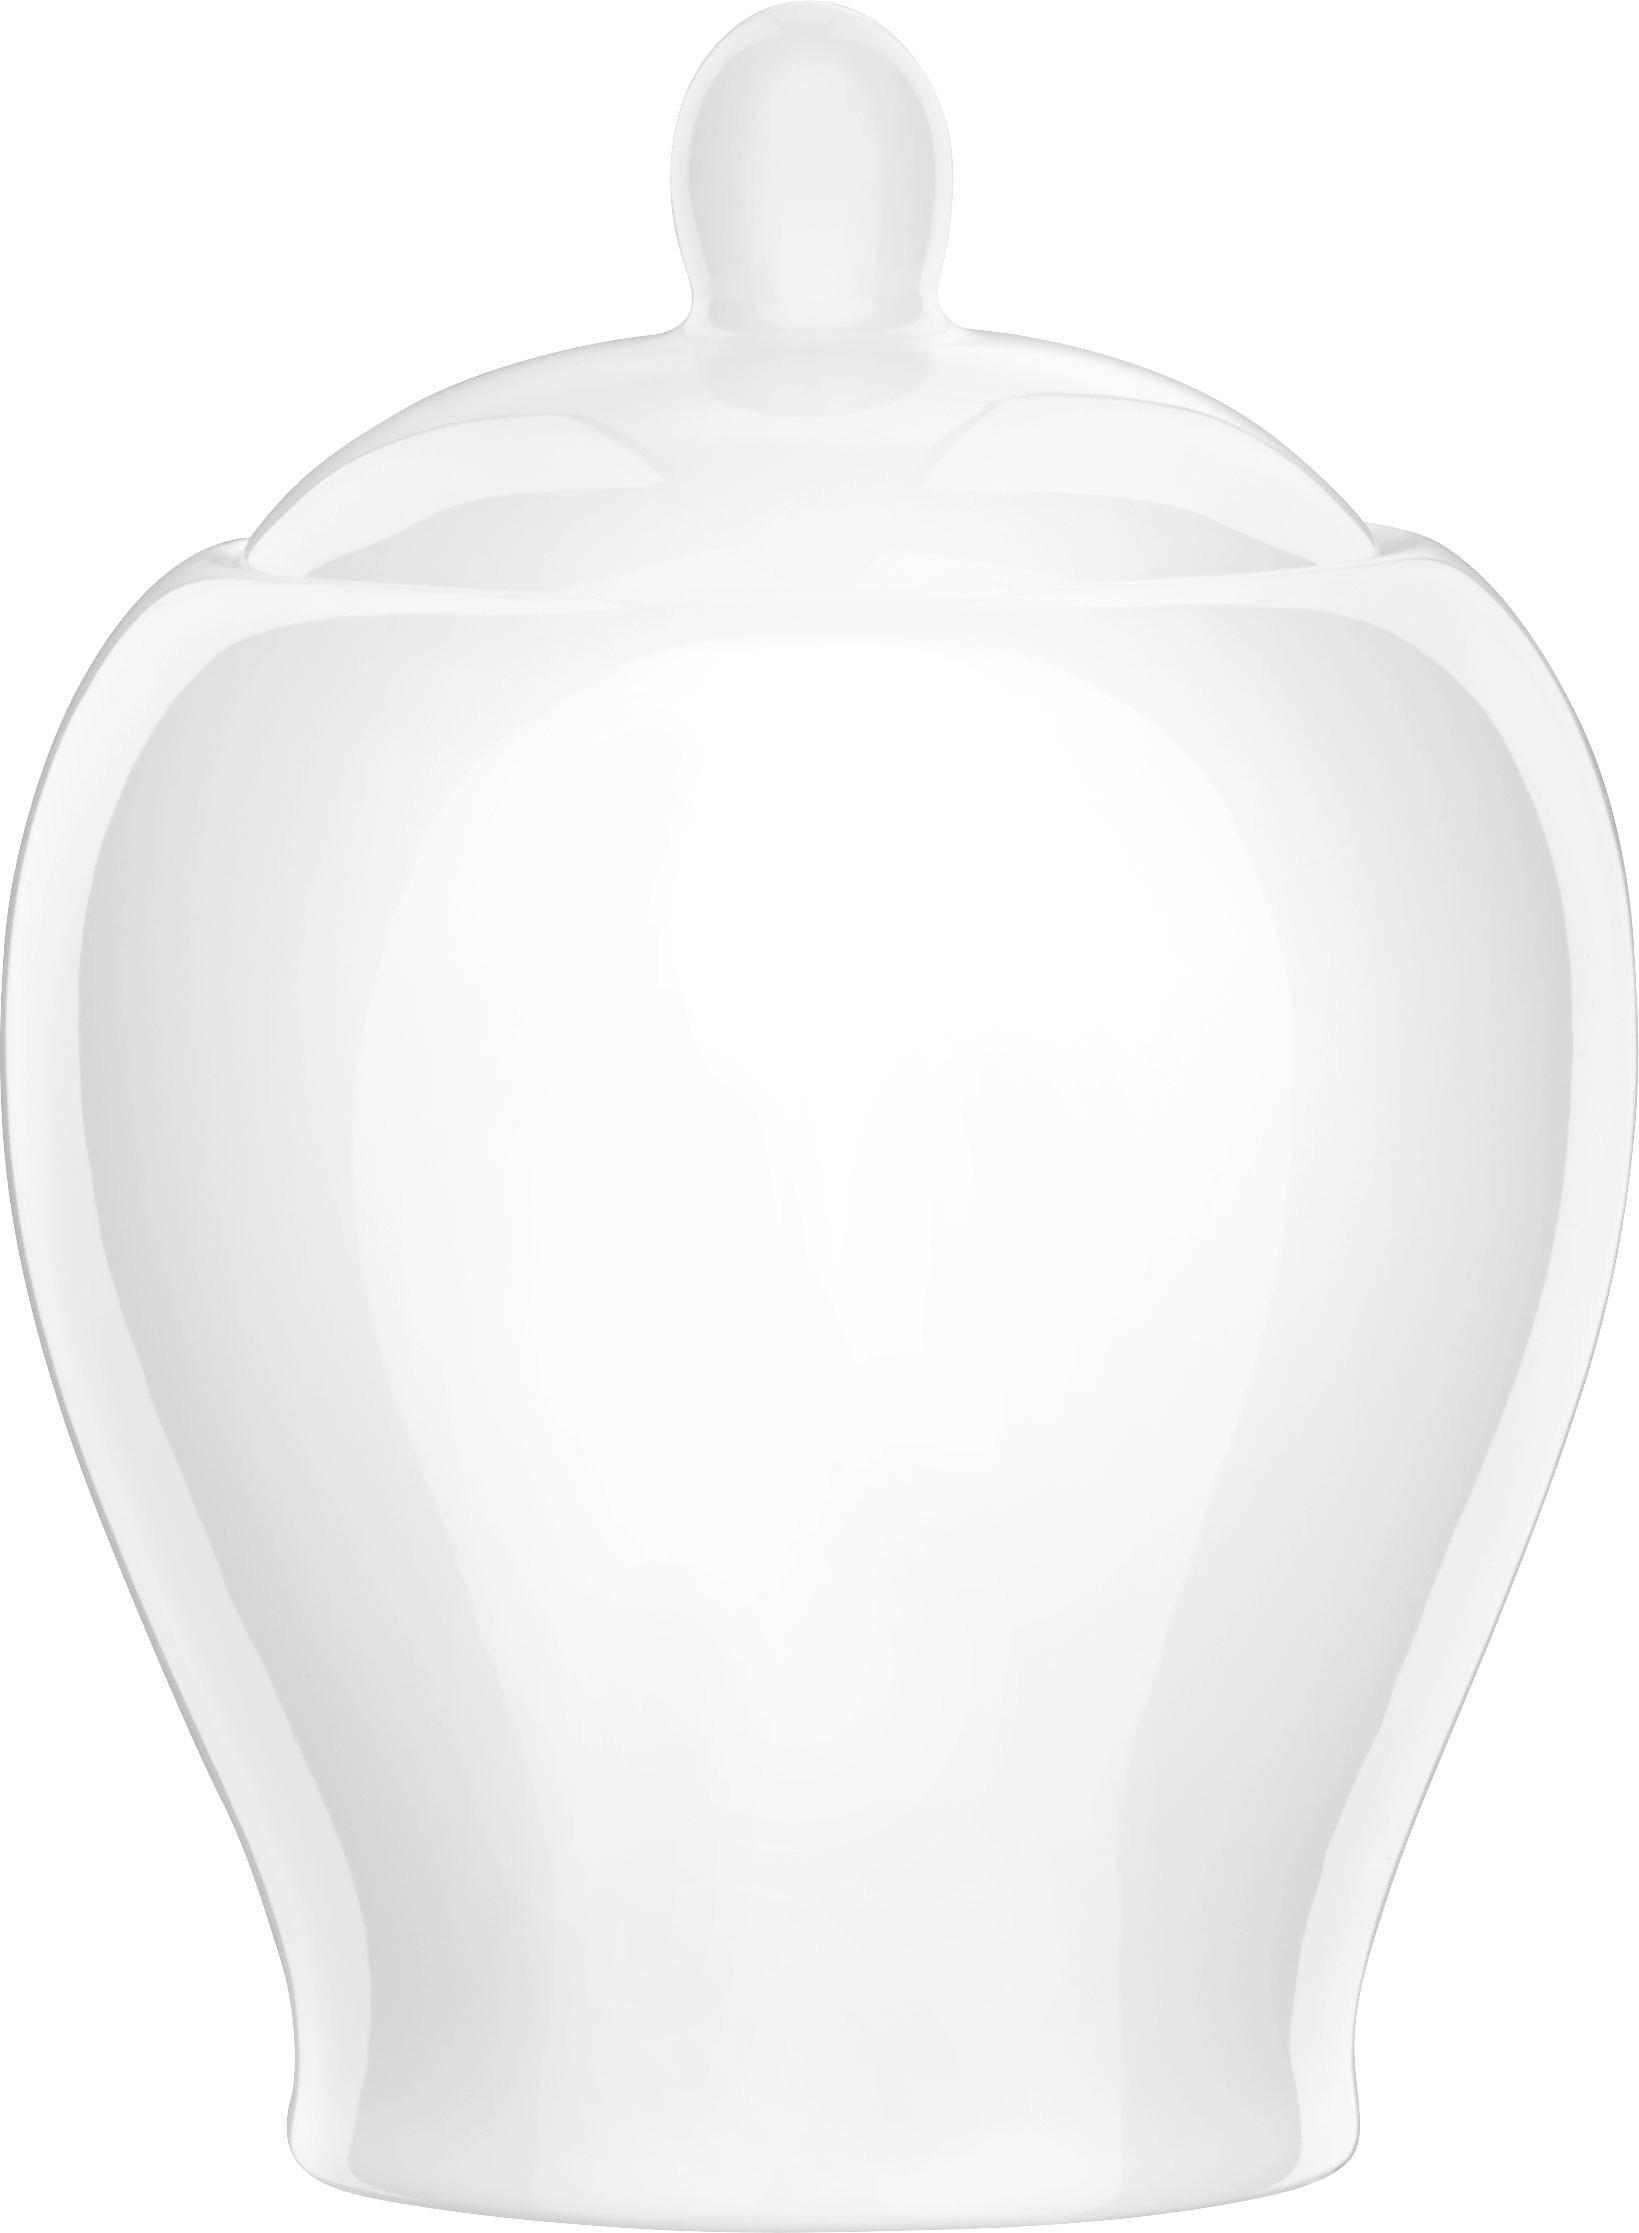 Cukortartó Bonnie - fehér, modern, kerámia (0,35l) - MÖMAX modern living